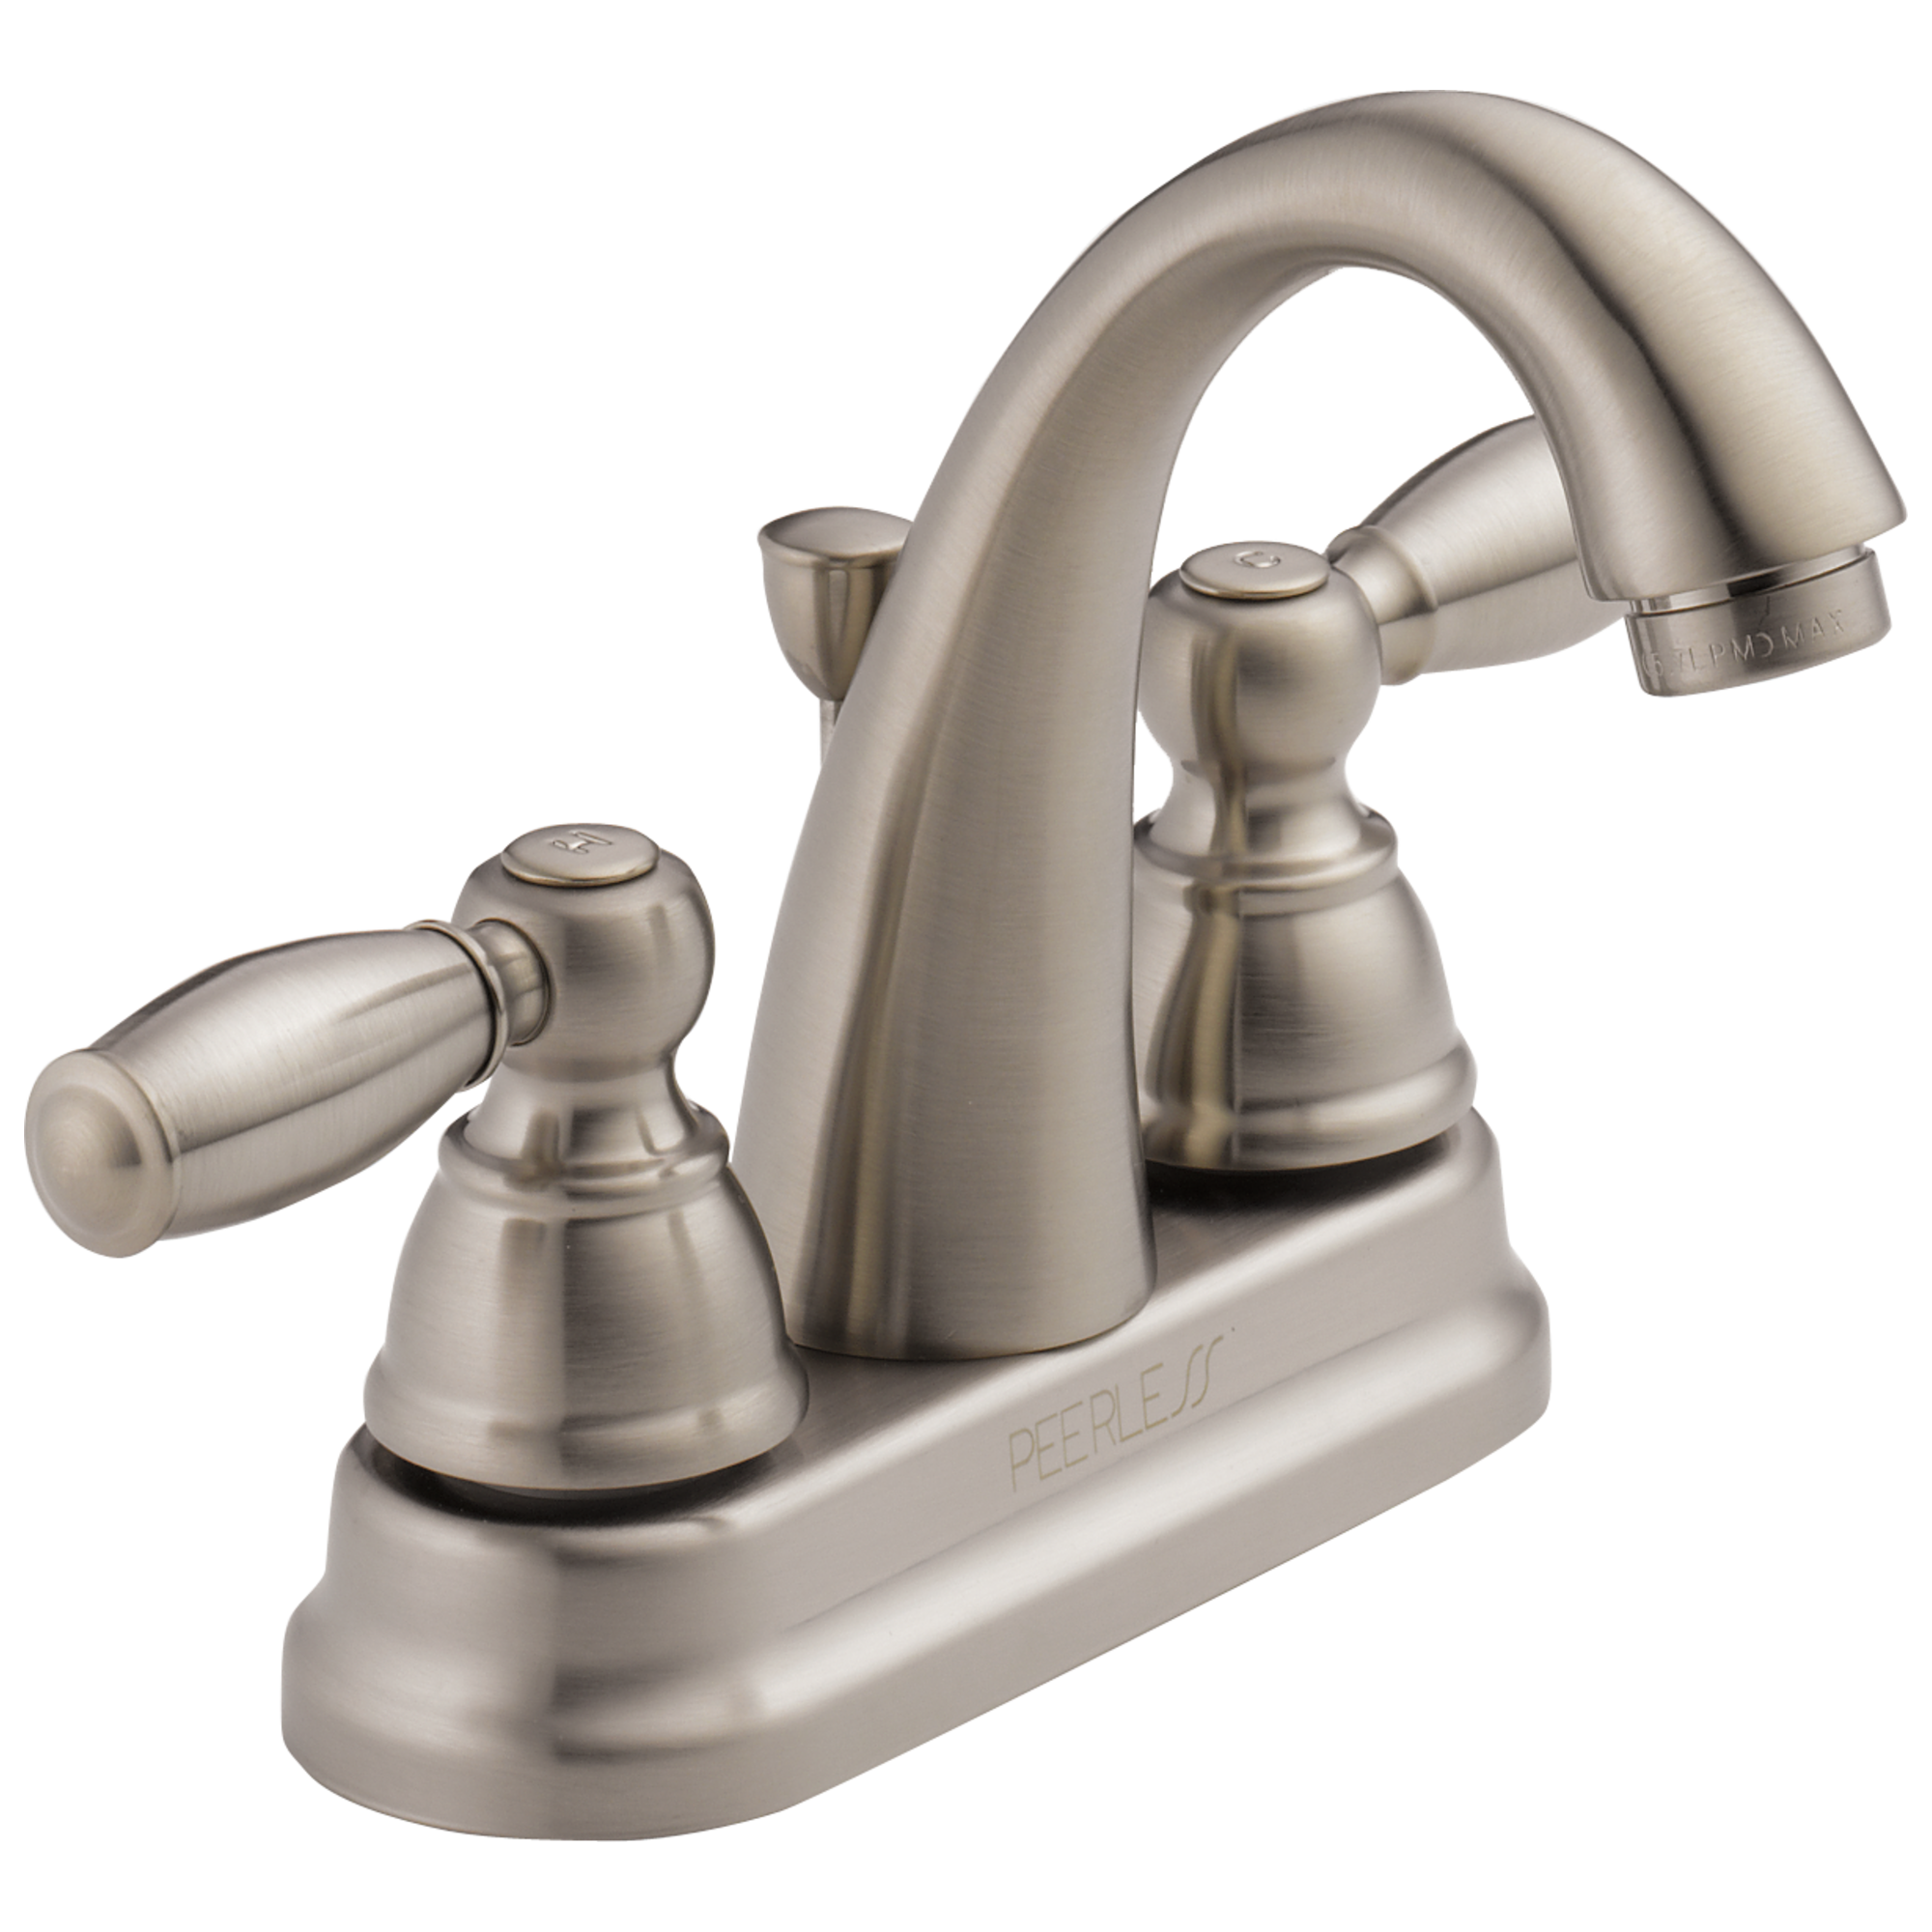 P LF BN Two Handle Lavatory Faucet